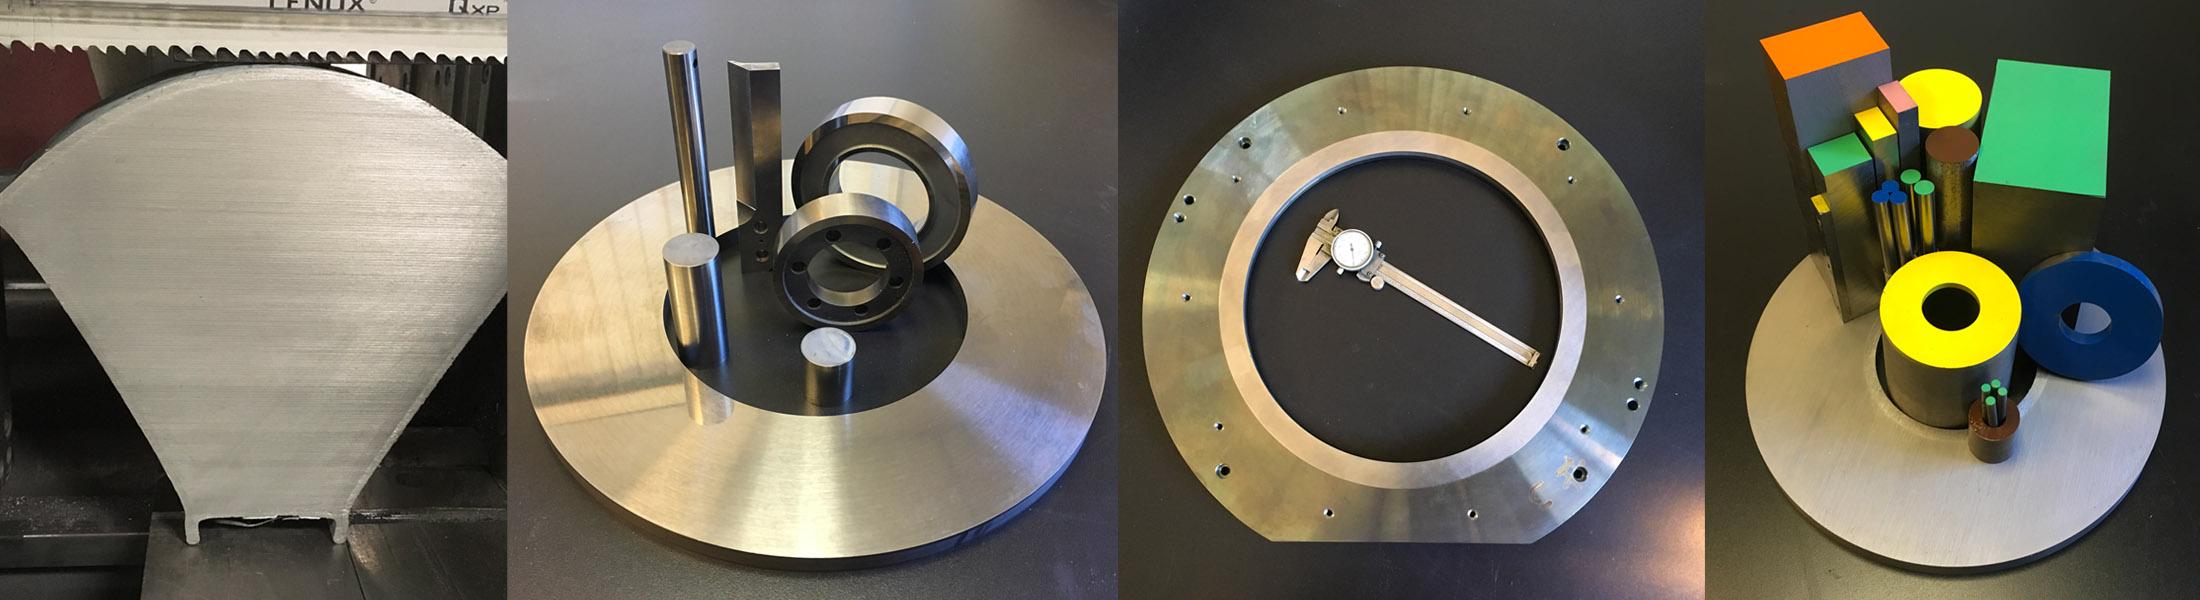 ferro-tic steel bonded carbide machining questions